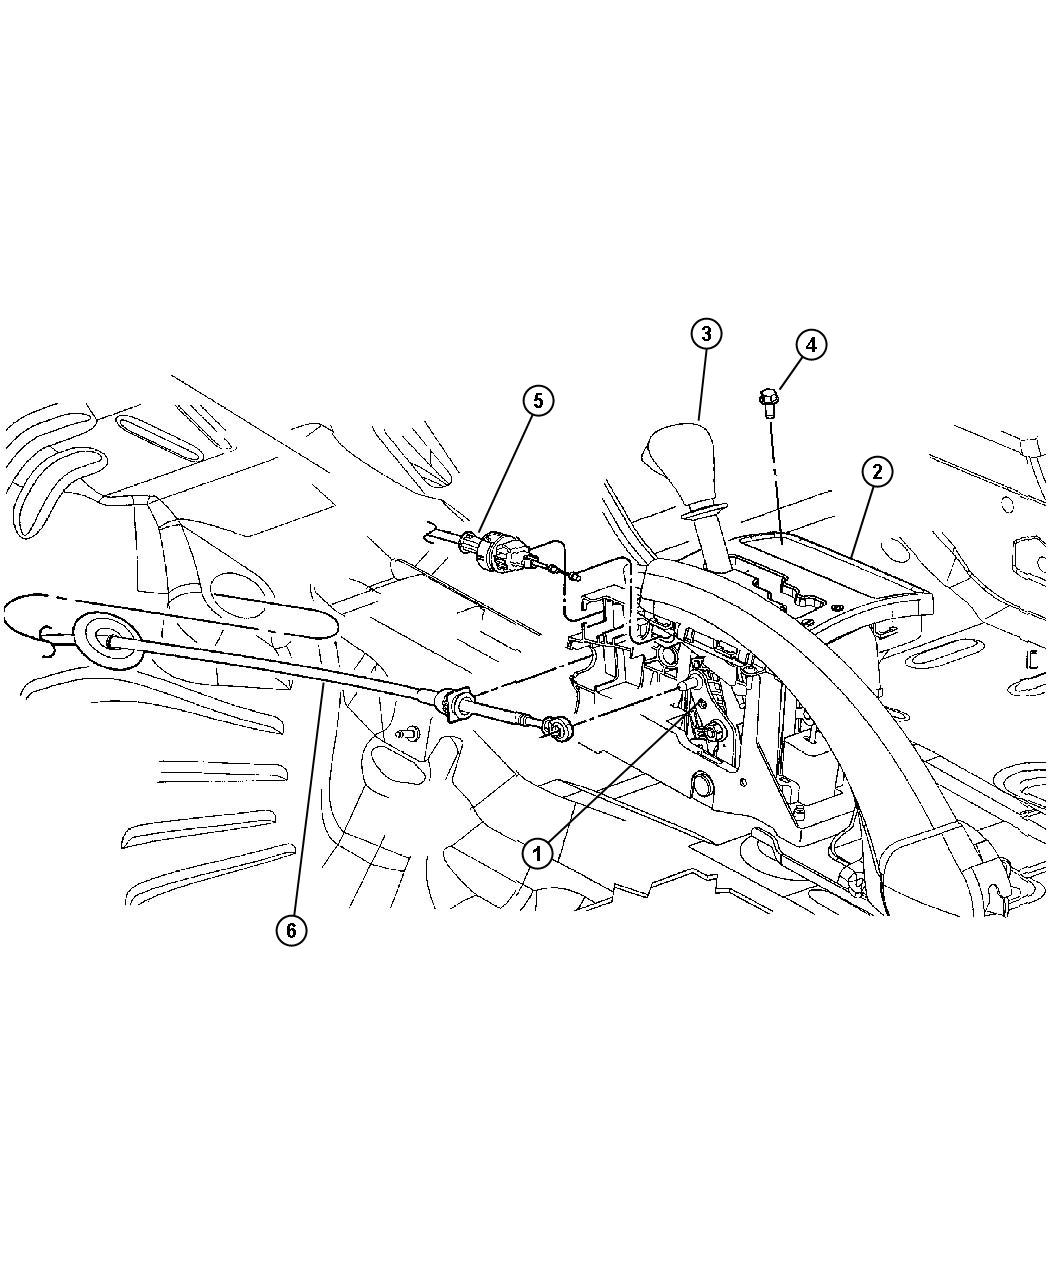 Jeep Grand Cherokee Prndl bezel. Gear selector